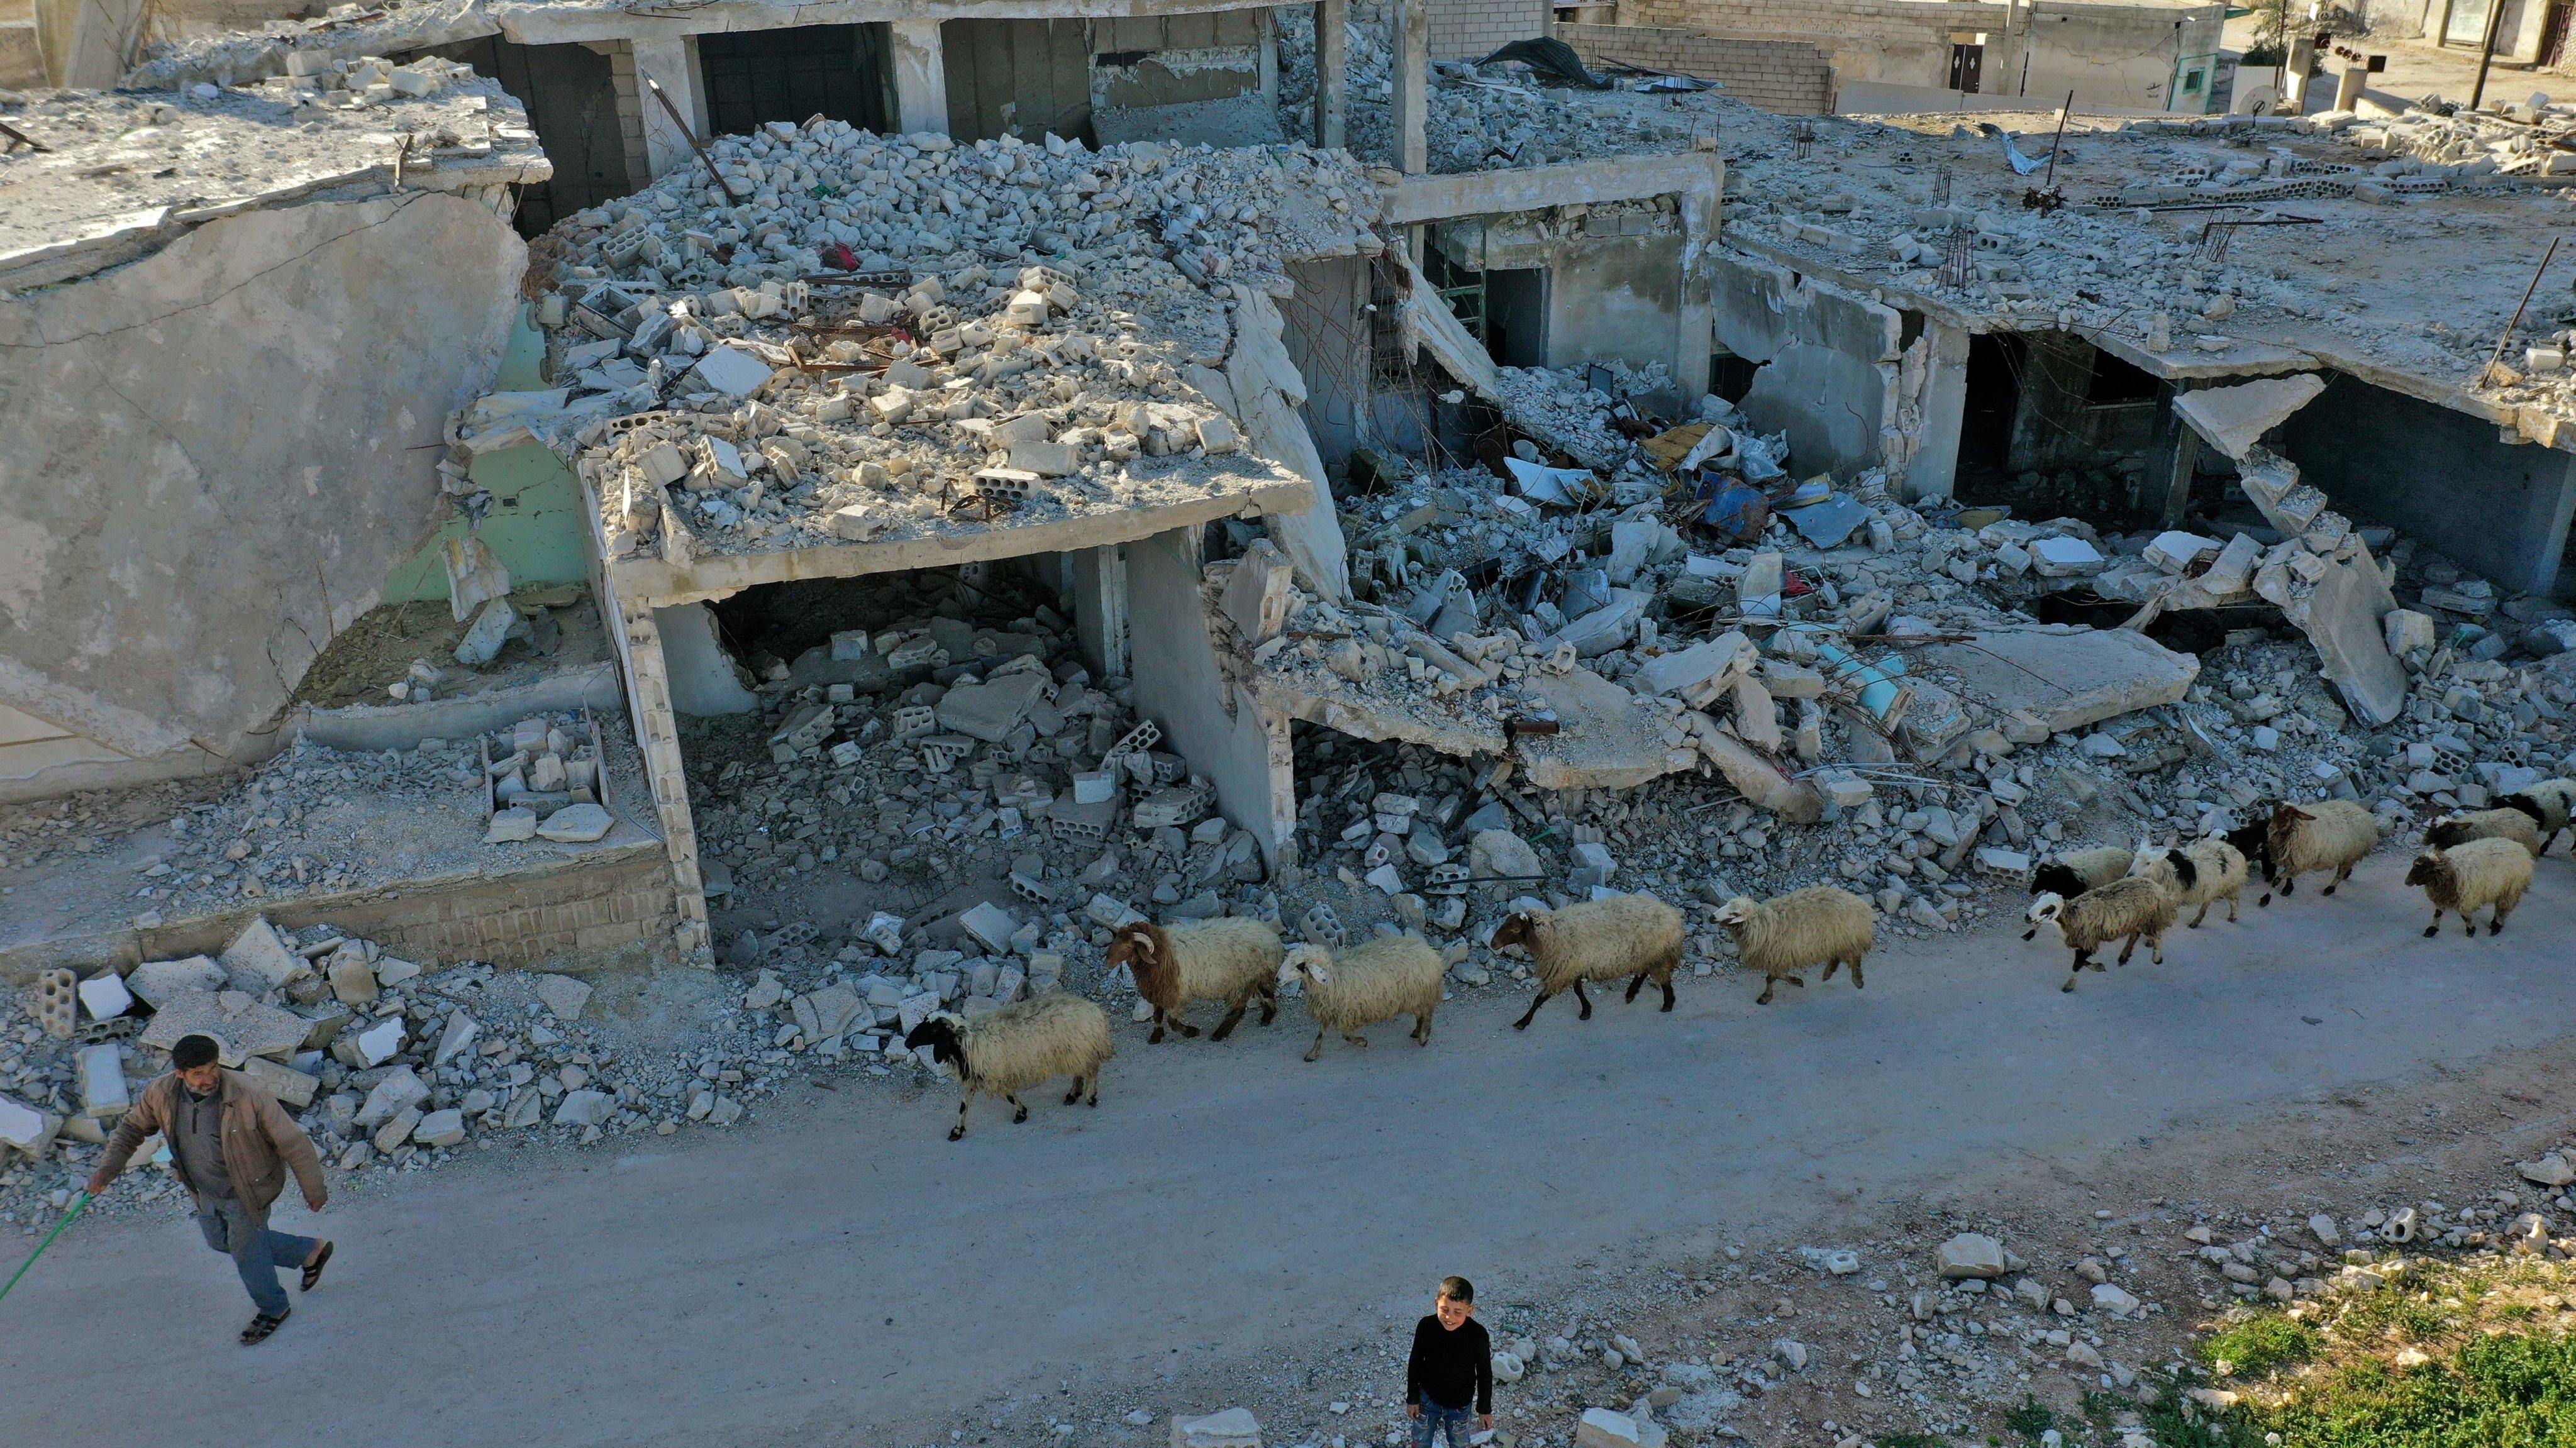 SYRIA-ARAB-REVOLUTION-ANNIVERSARY